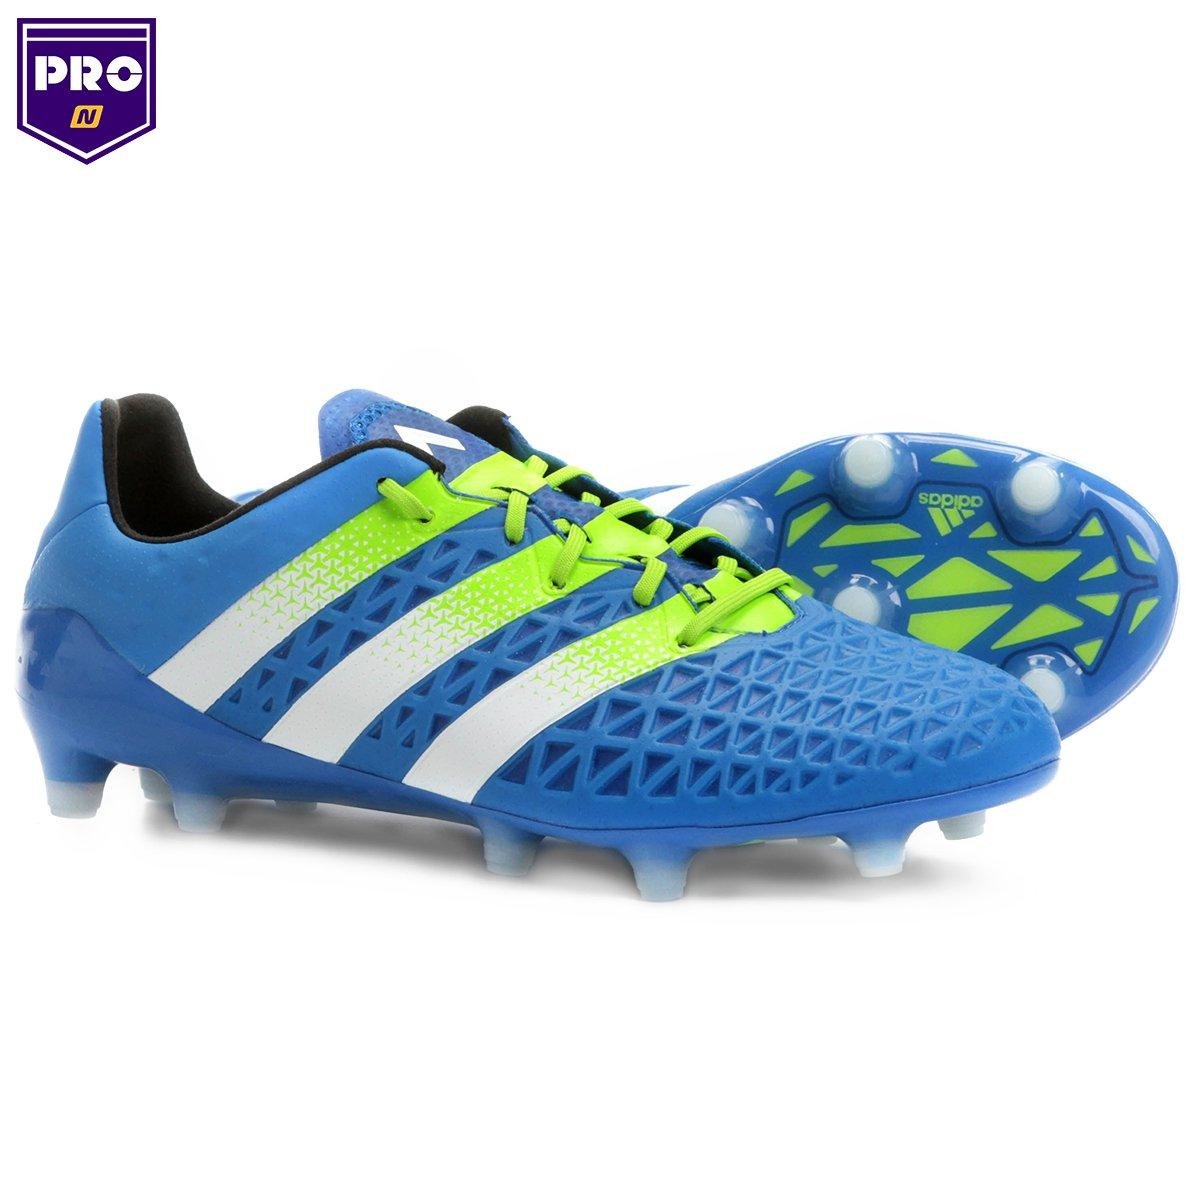 01d489838eb49 Chuteira Adidas Ace 16.1 FG - Campo - Compre Agora